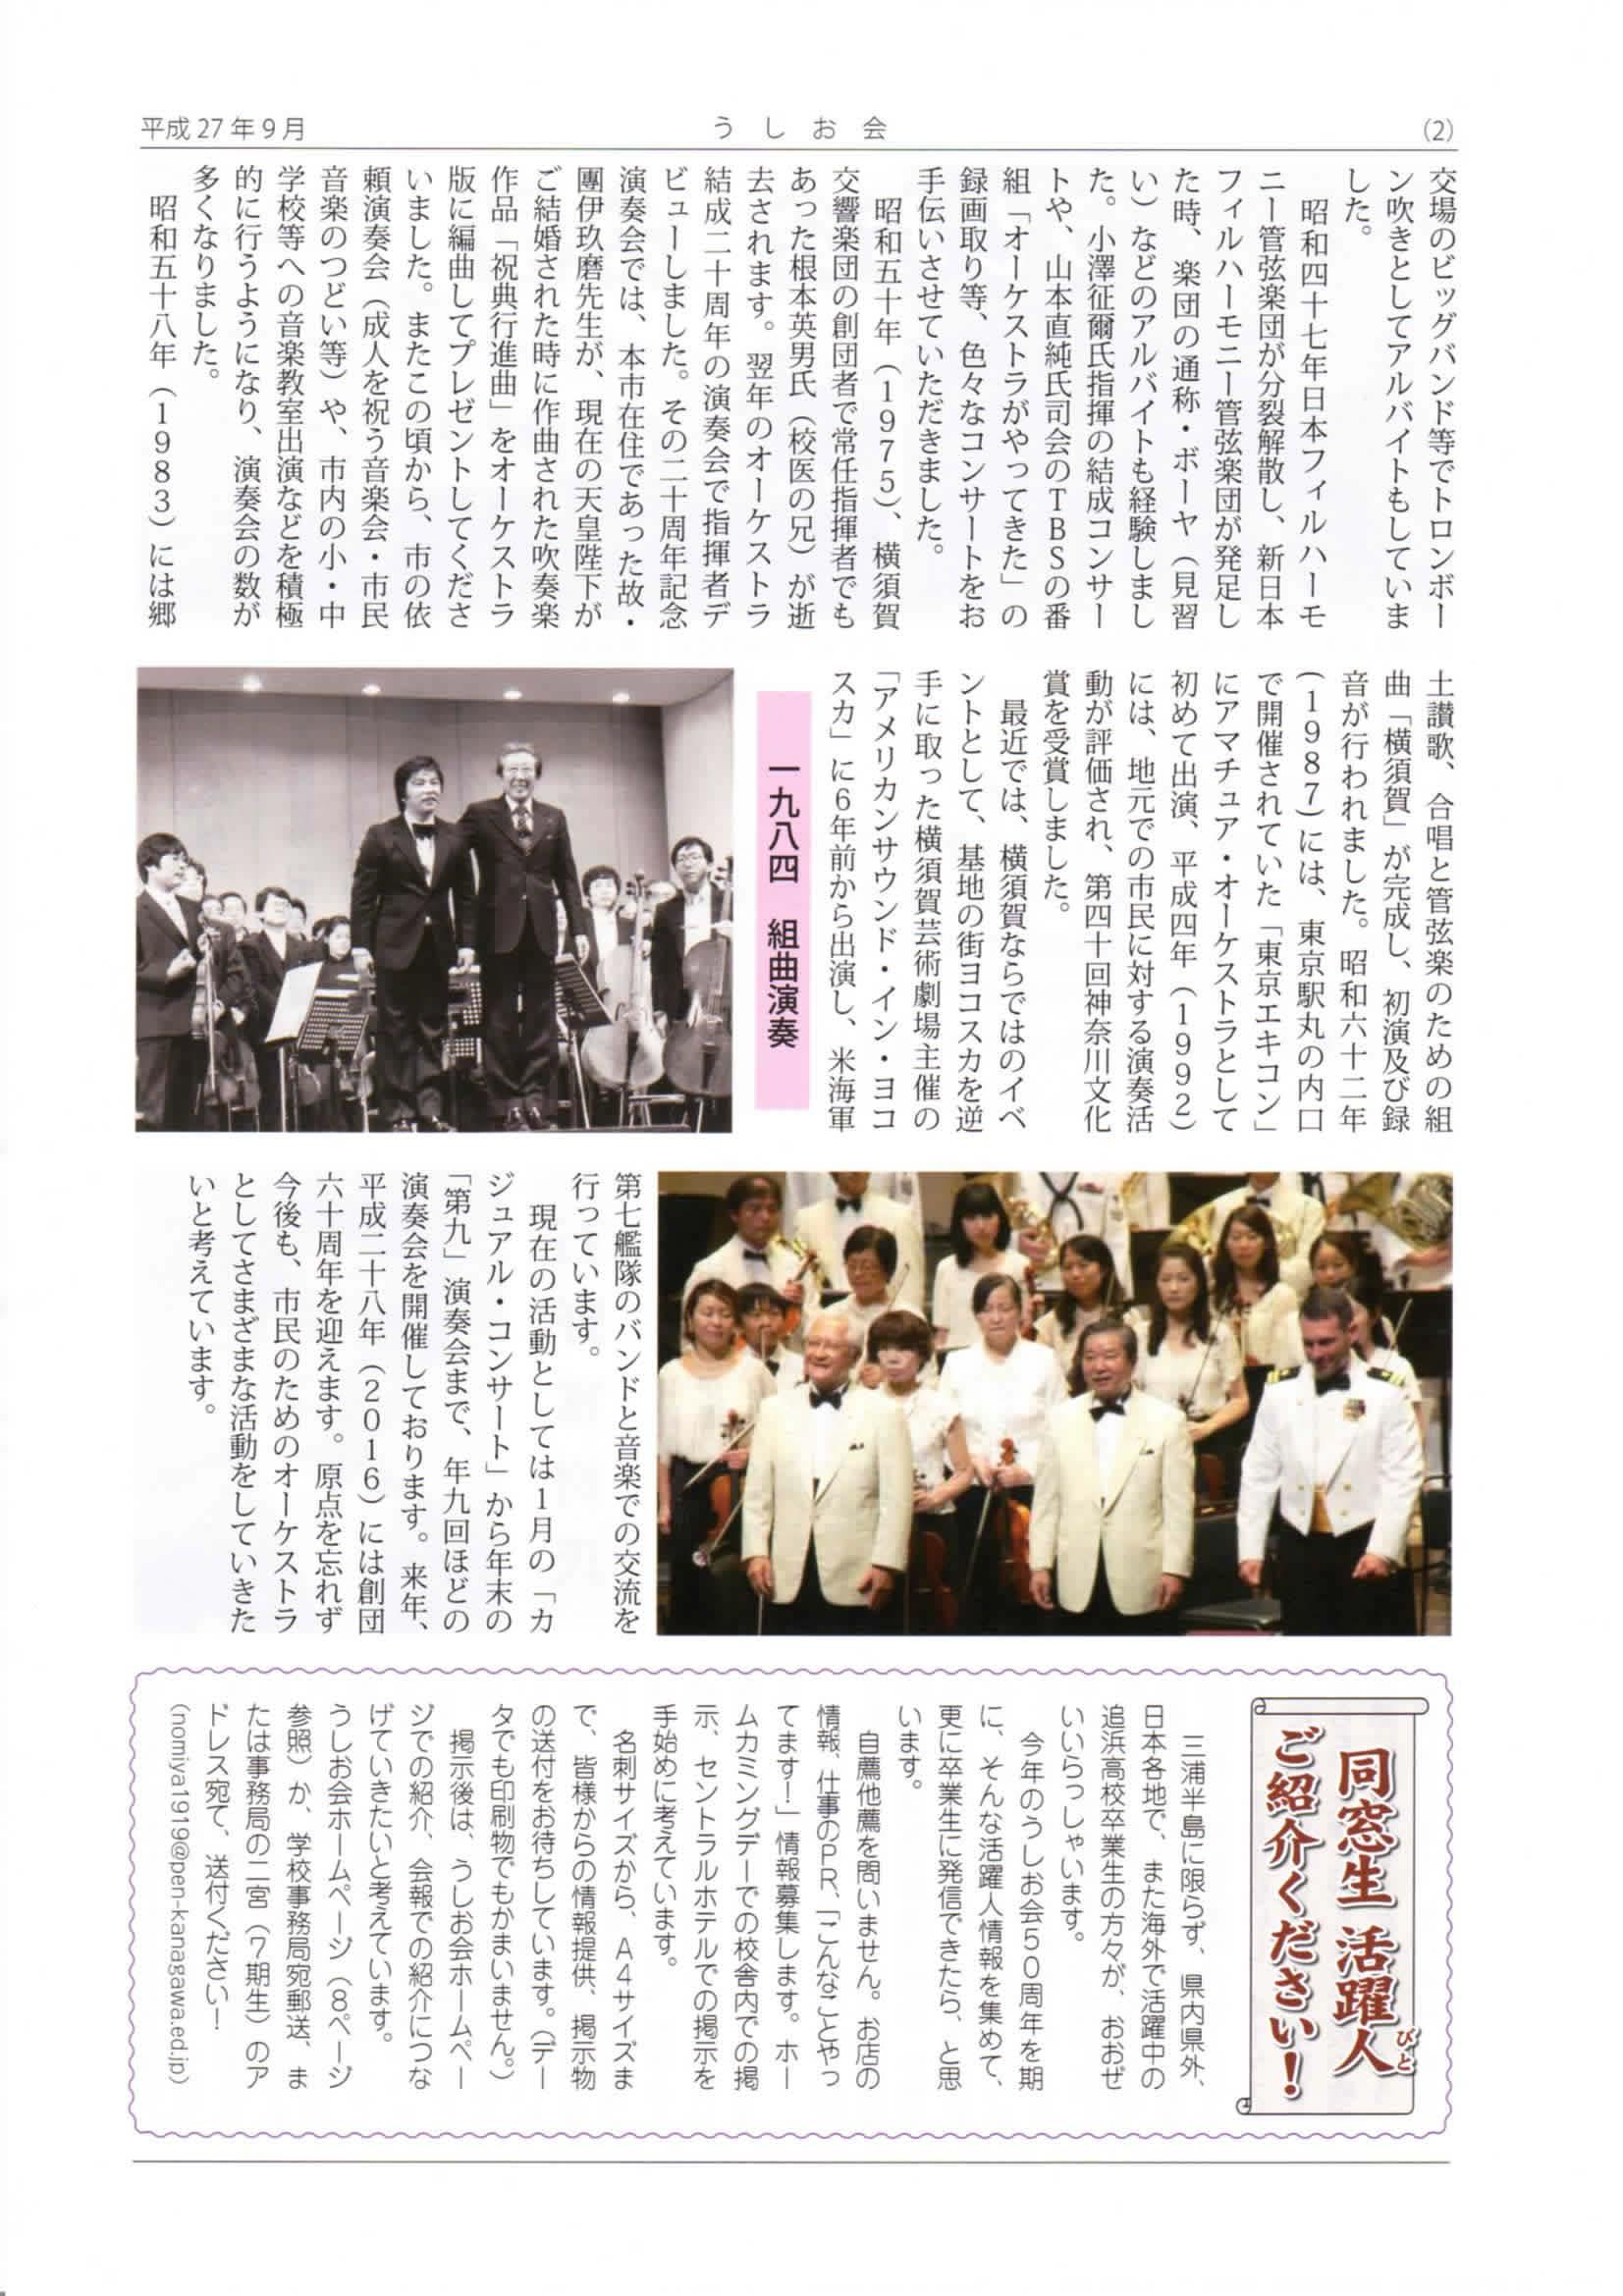 http://www.xn--p8ji2b326tgf0astg8i7difs.jp/ushio-info/images/ushio_201509_2.jpg